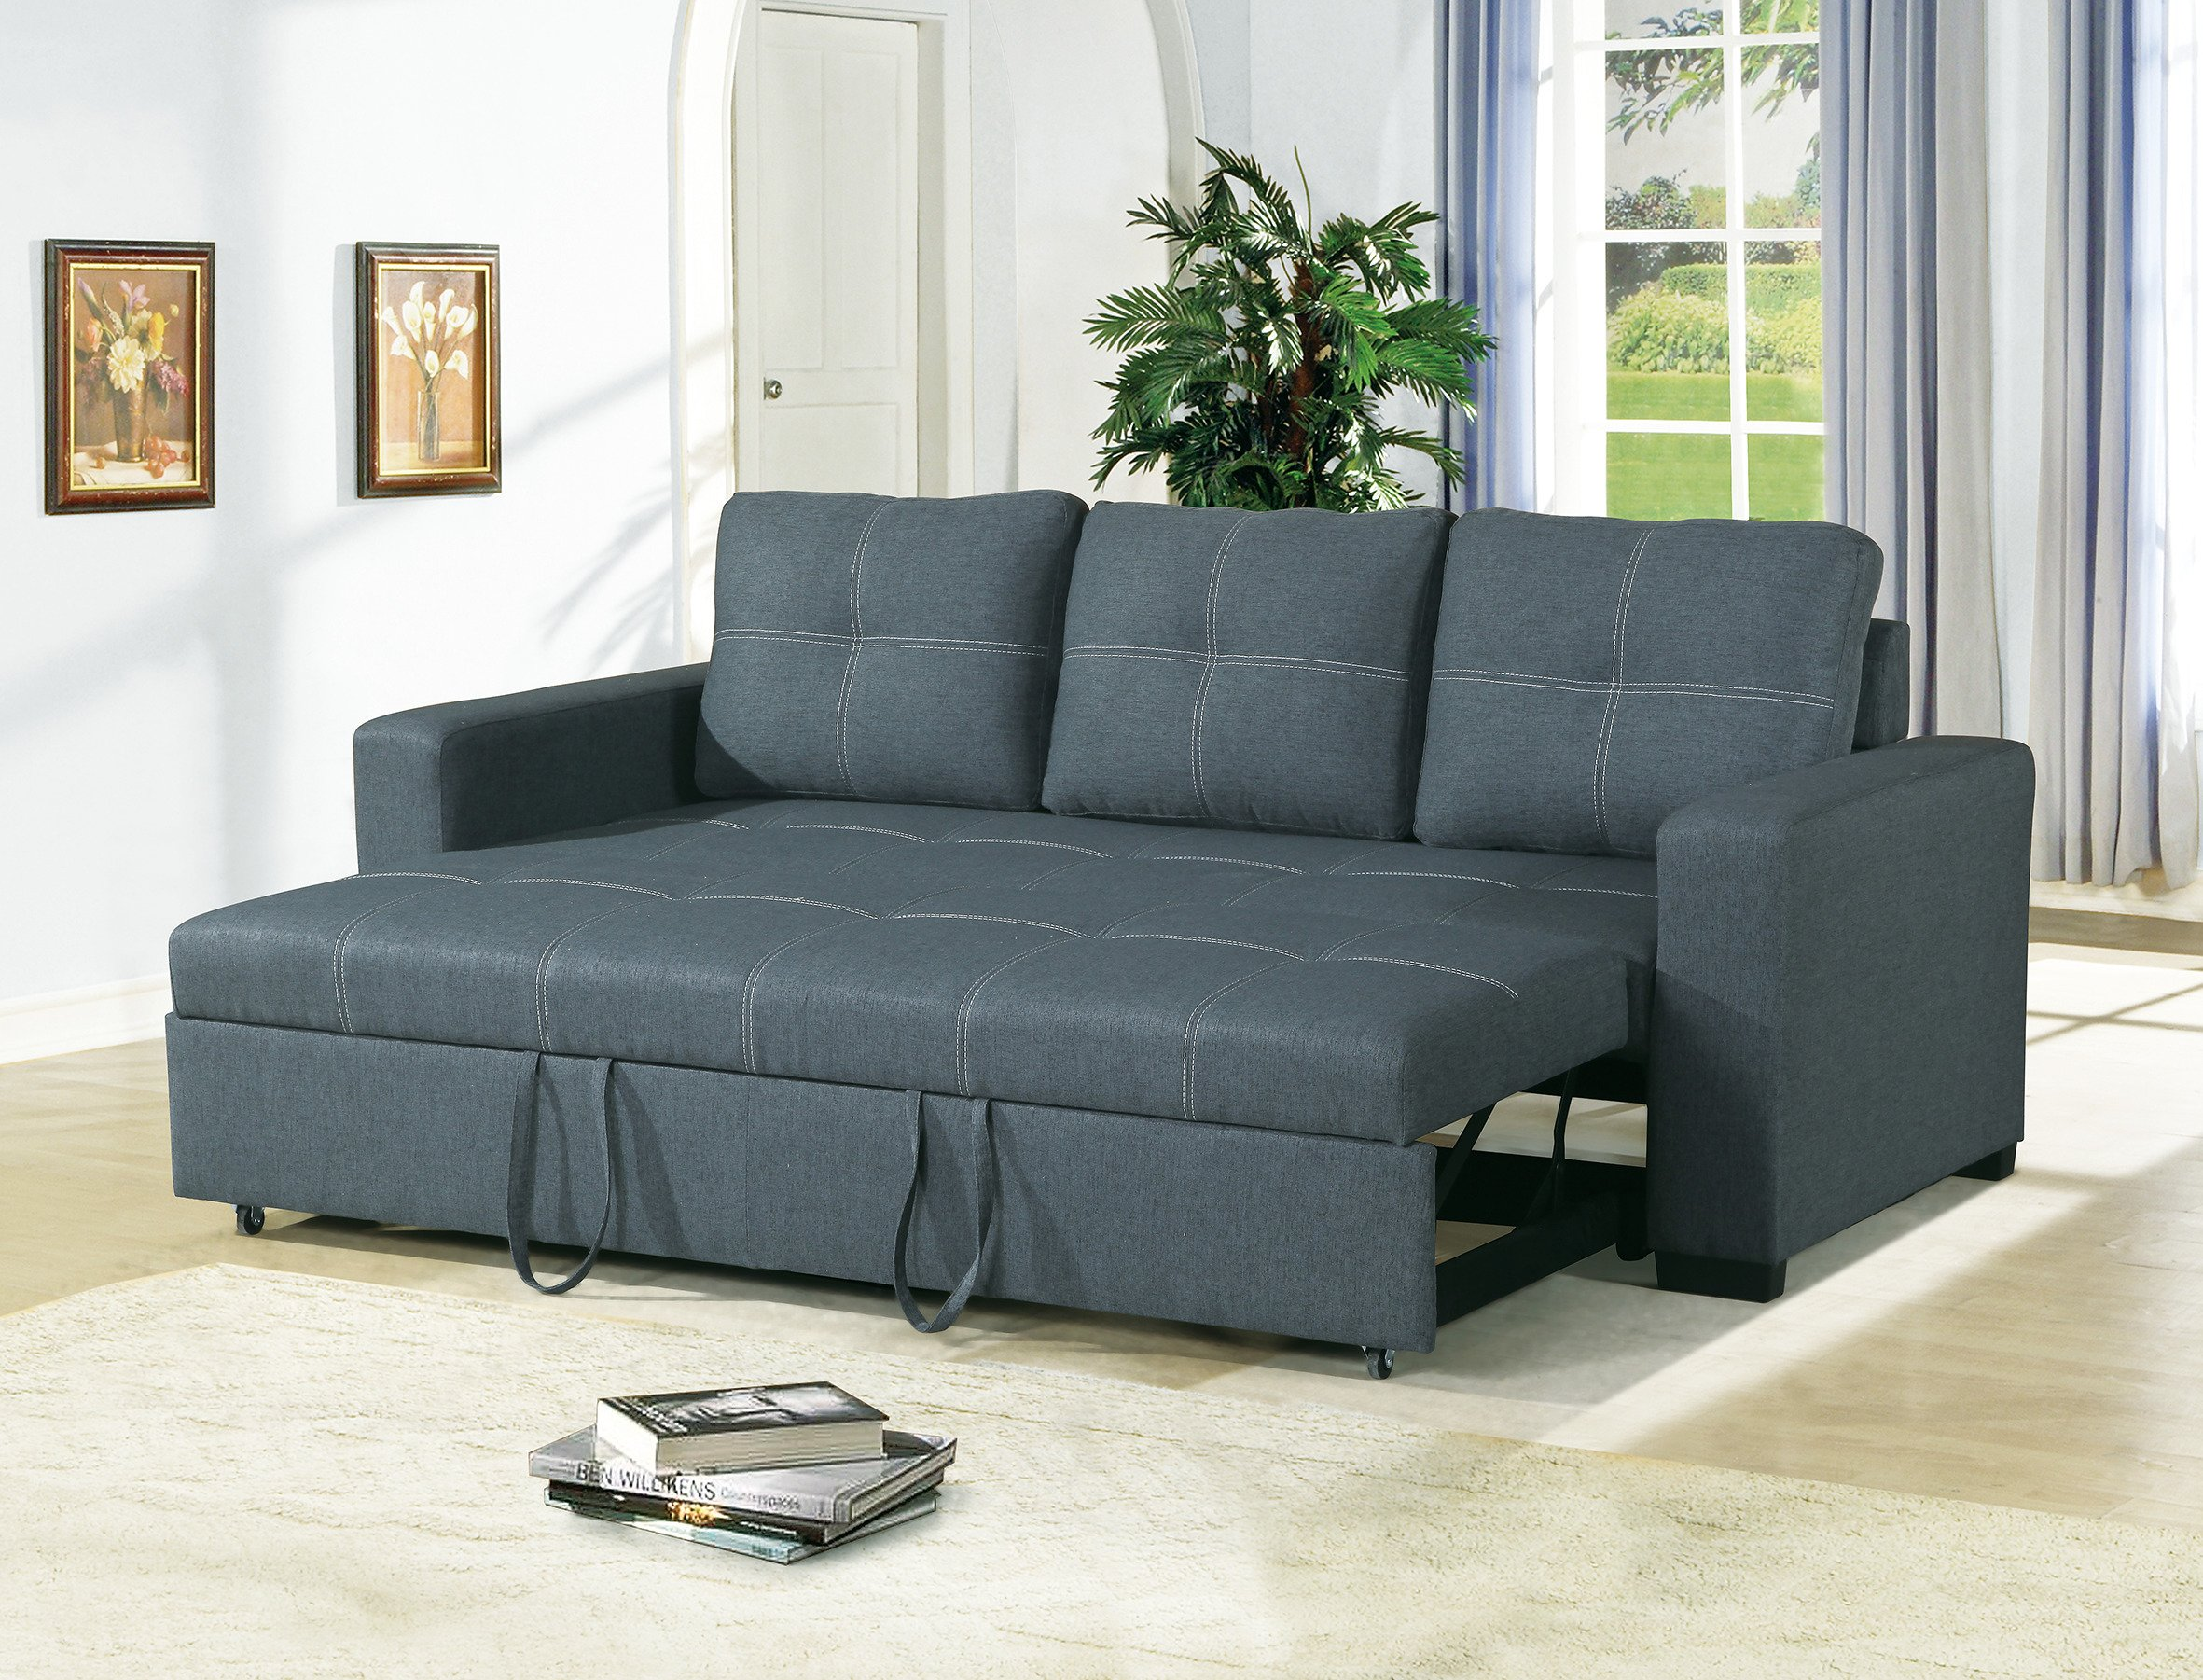 - Esofastore Convertible Sofa Bed Bobkona Living Room Sofa W Pull